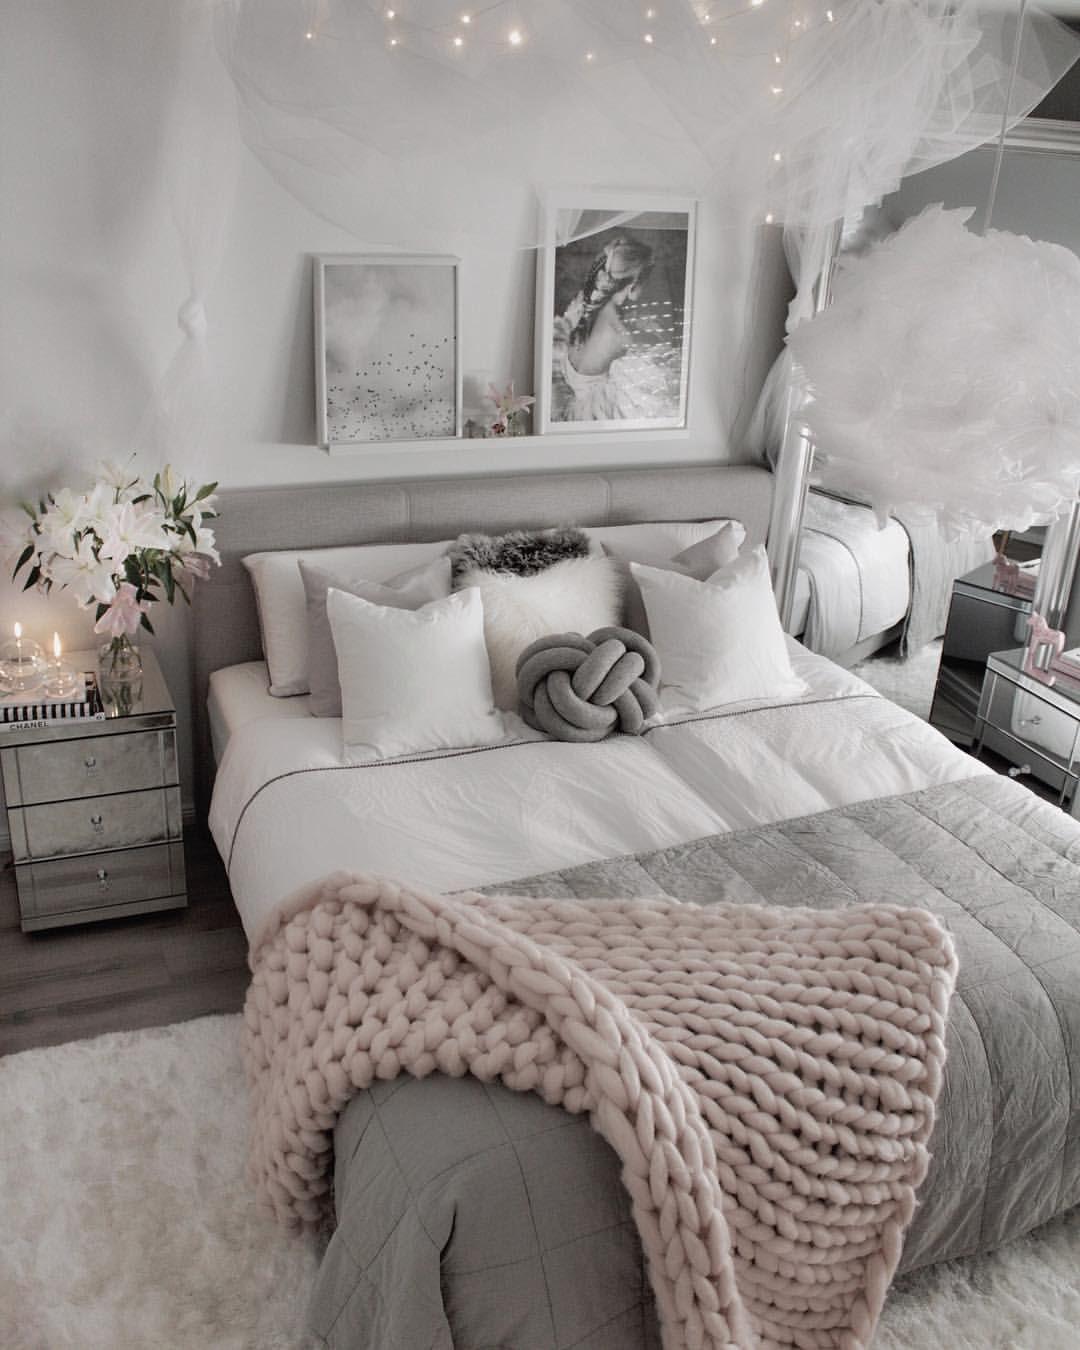 Bildet Tilh 248 Rer Picture Belongs T Bedroom Designs For Couples Small Room Bedroom Master